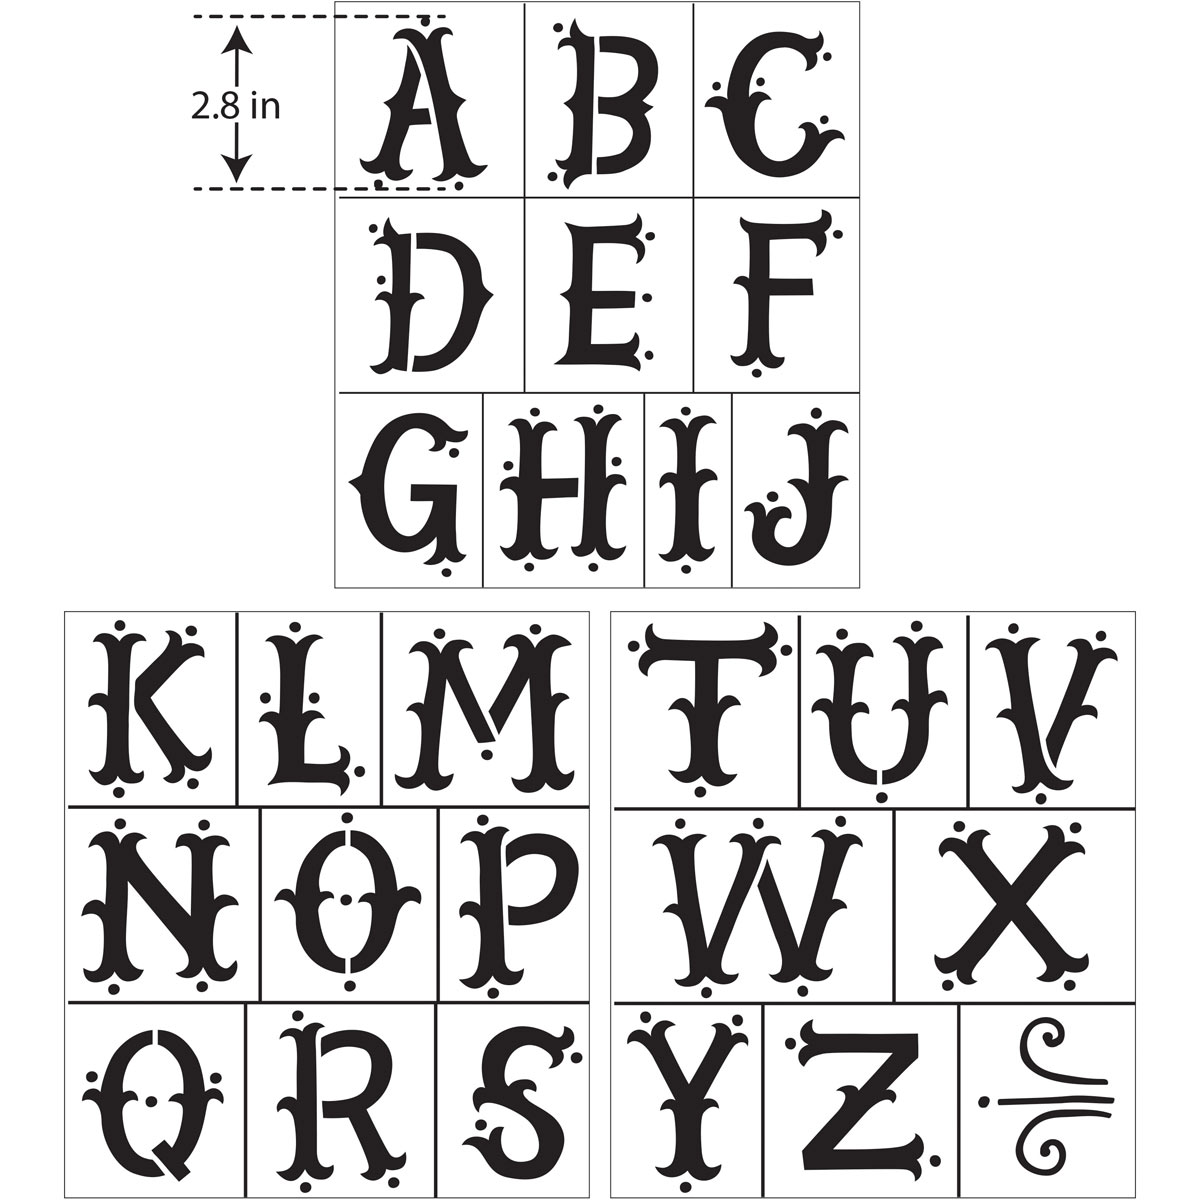 Hallmark Handcrafted Adhesive Stencils - Enchanting Font, 8-1/2